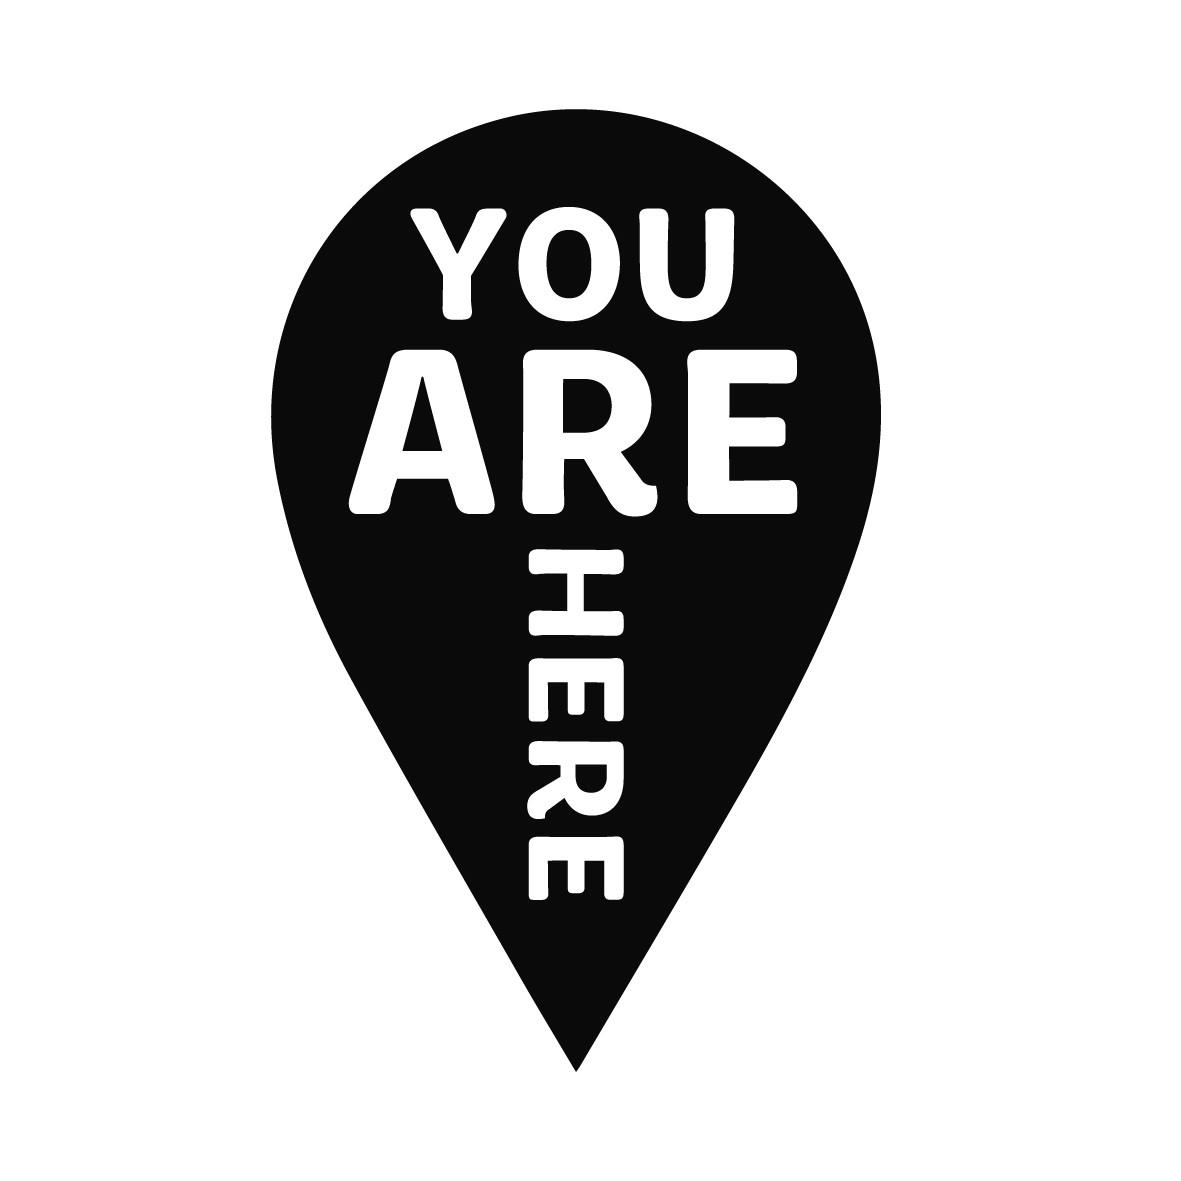 Adesivo de Parede You Are Here